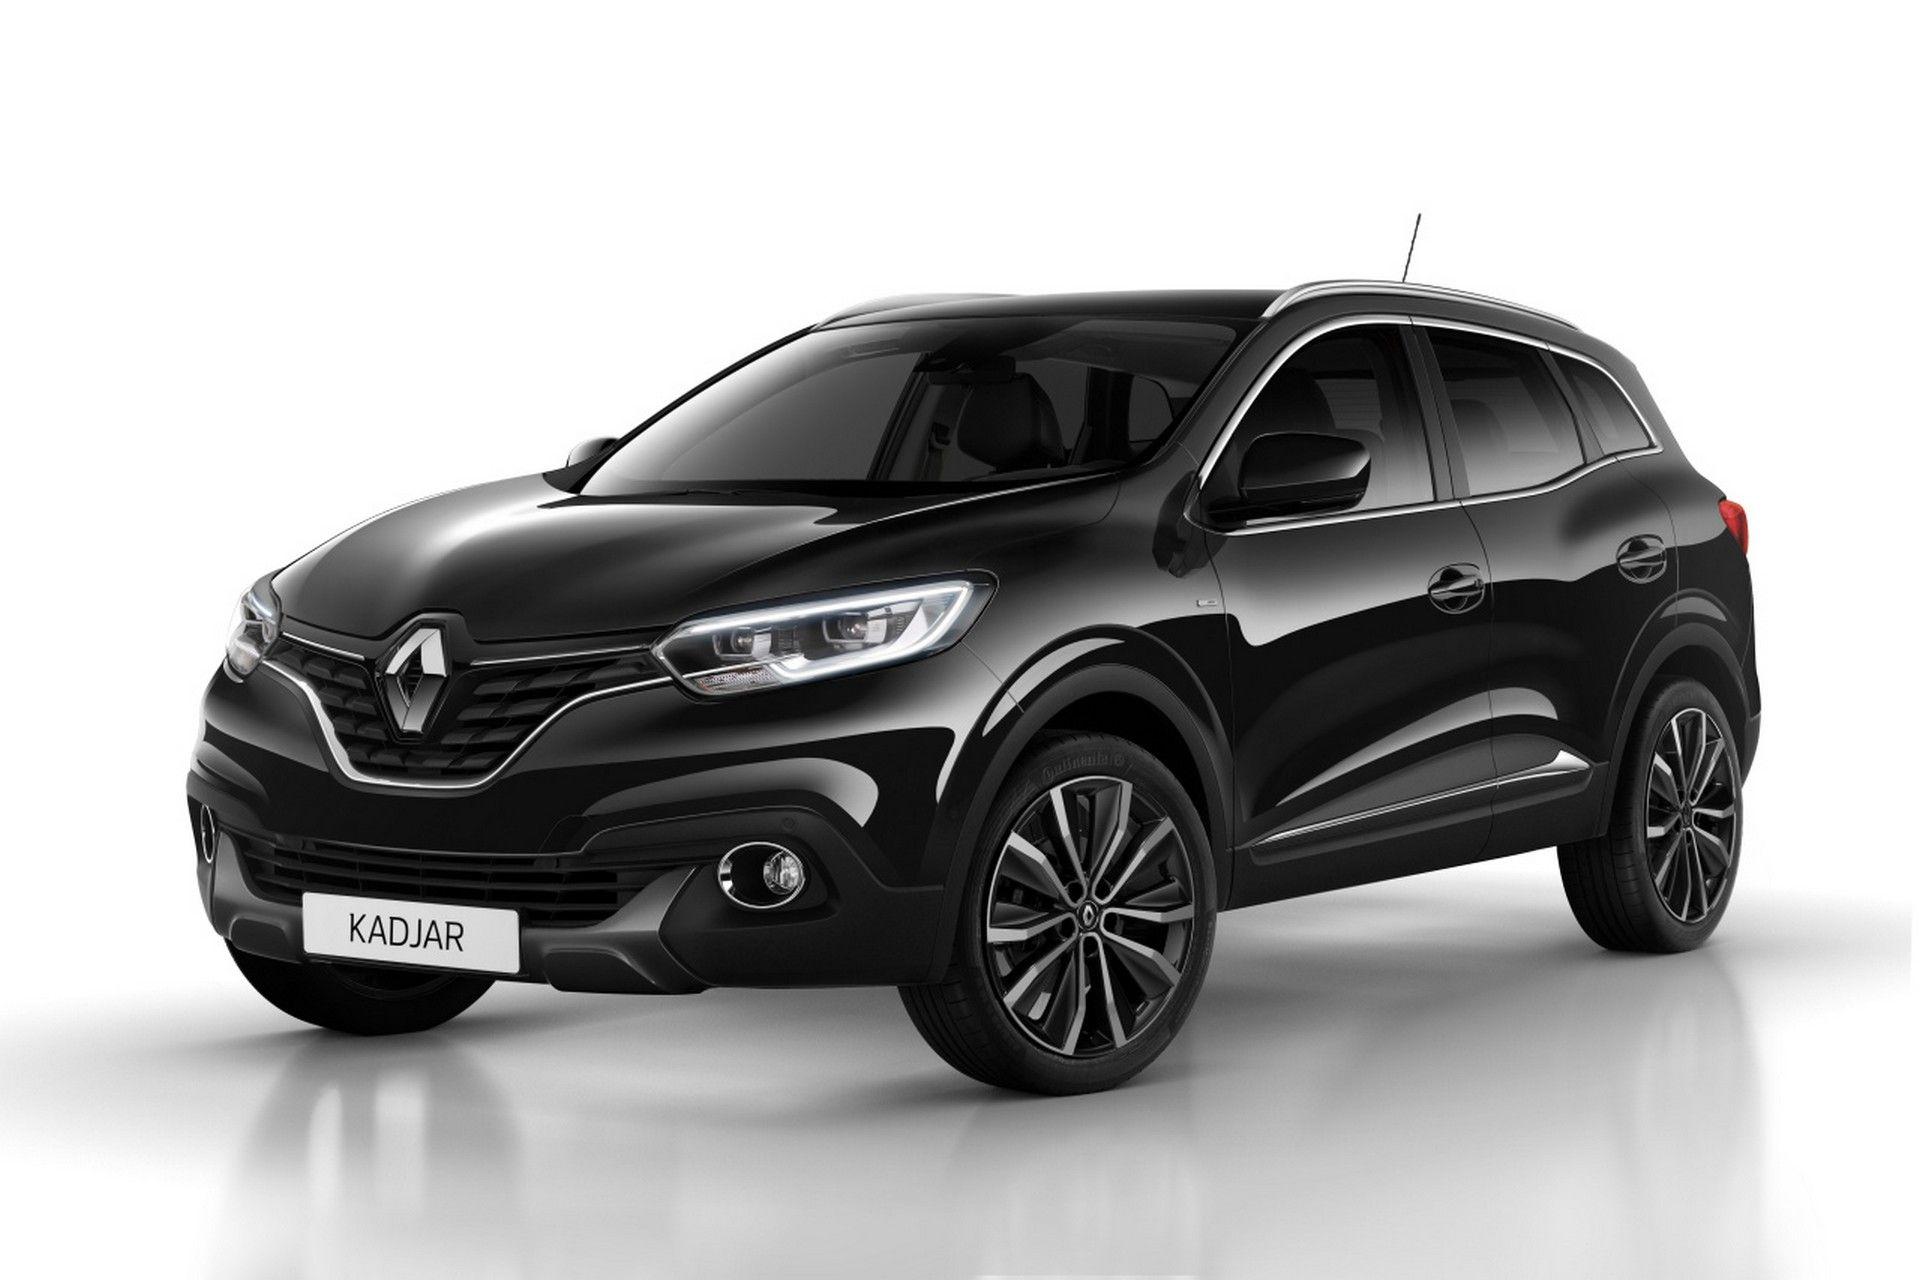 2020 Renault Kadjar Redesign, Interior >> 2020 Renault Kadjar Release Date Cars And Trucks New Upcoming